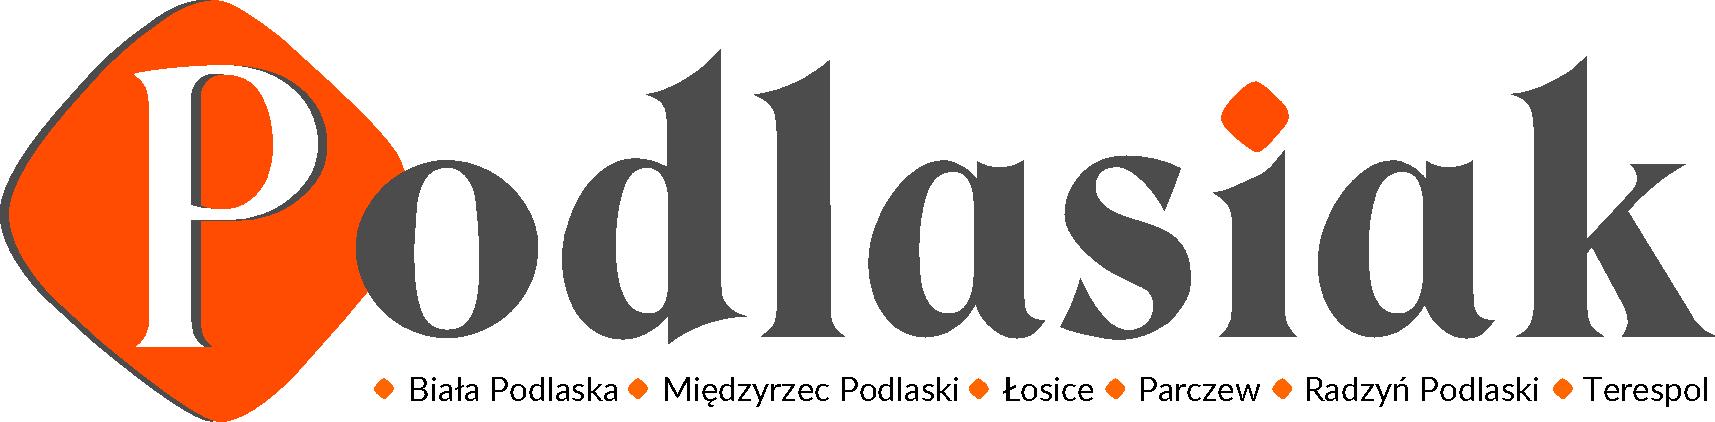 PODLASUAK_LOGO